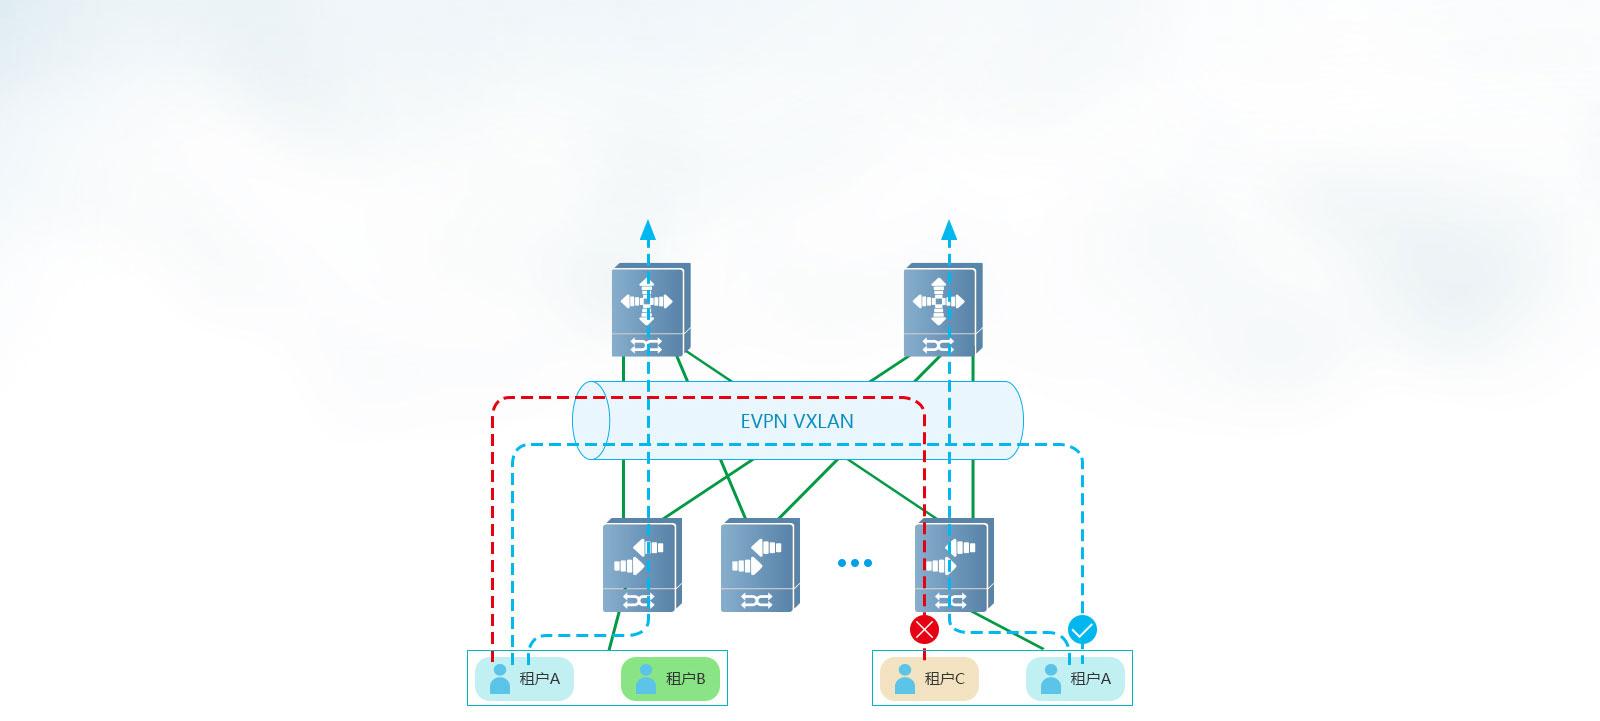 EVPN VXLAN: Anycast gateway? - Hewlett Packard Enterprise Community